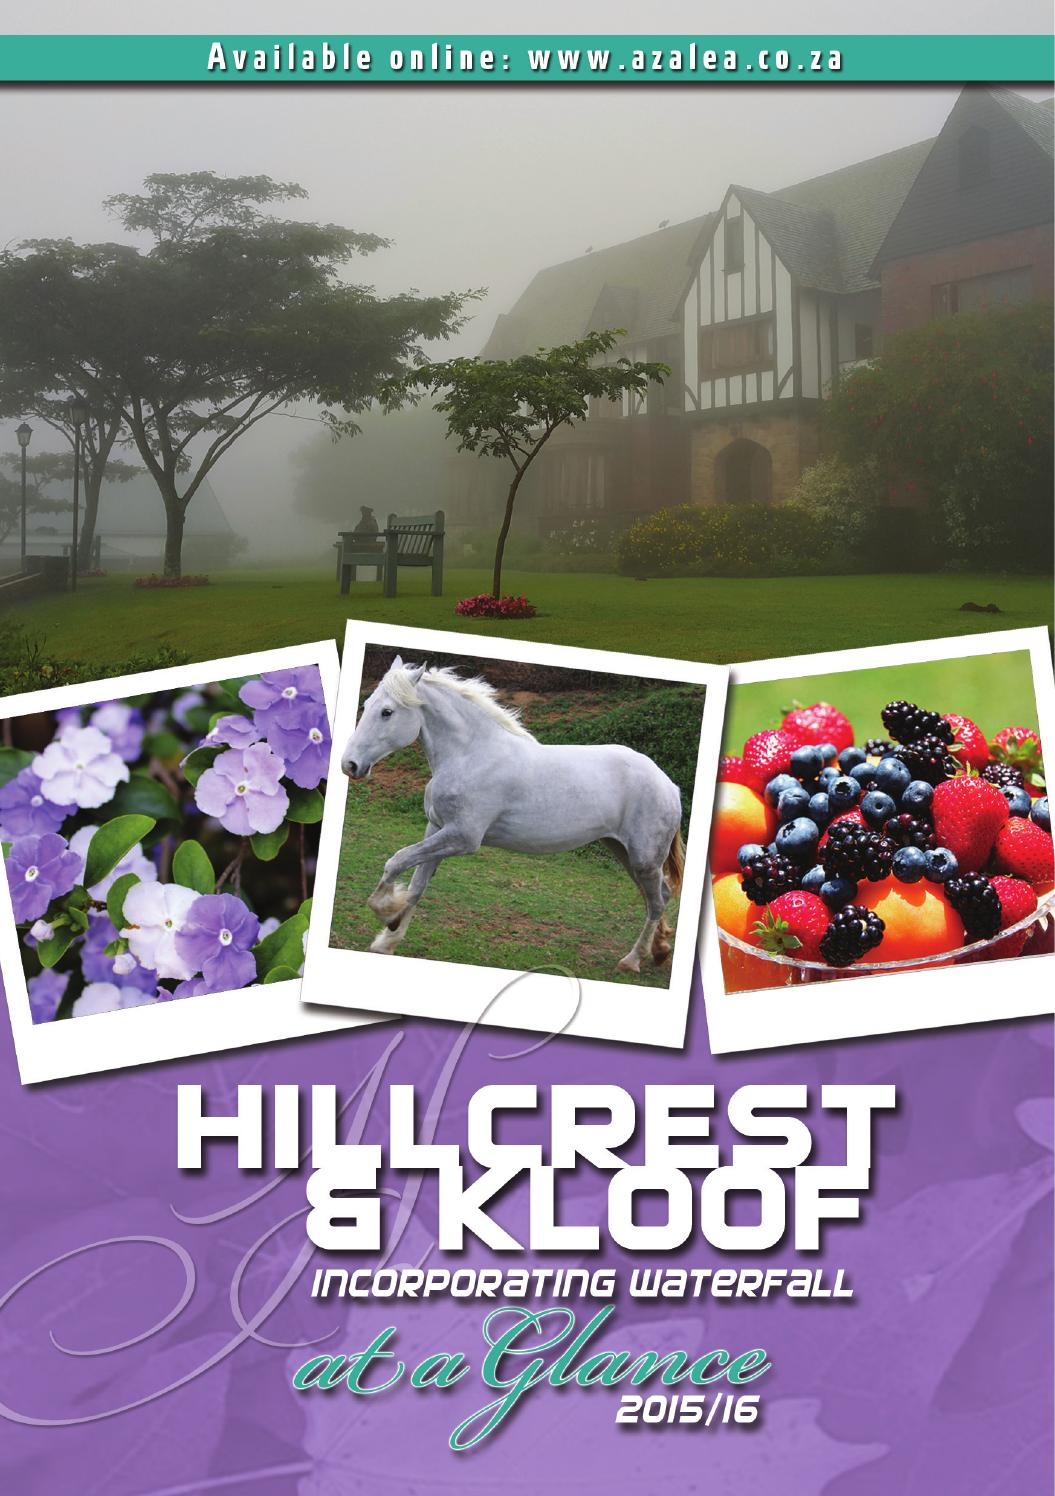 Hillcrest Amp Kloof A Glance 2015 16 By Lyn G Issuu